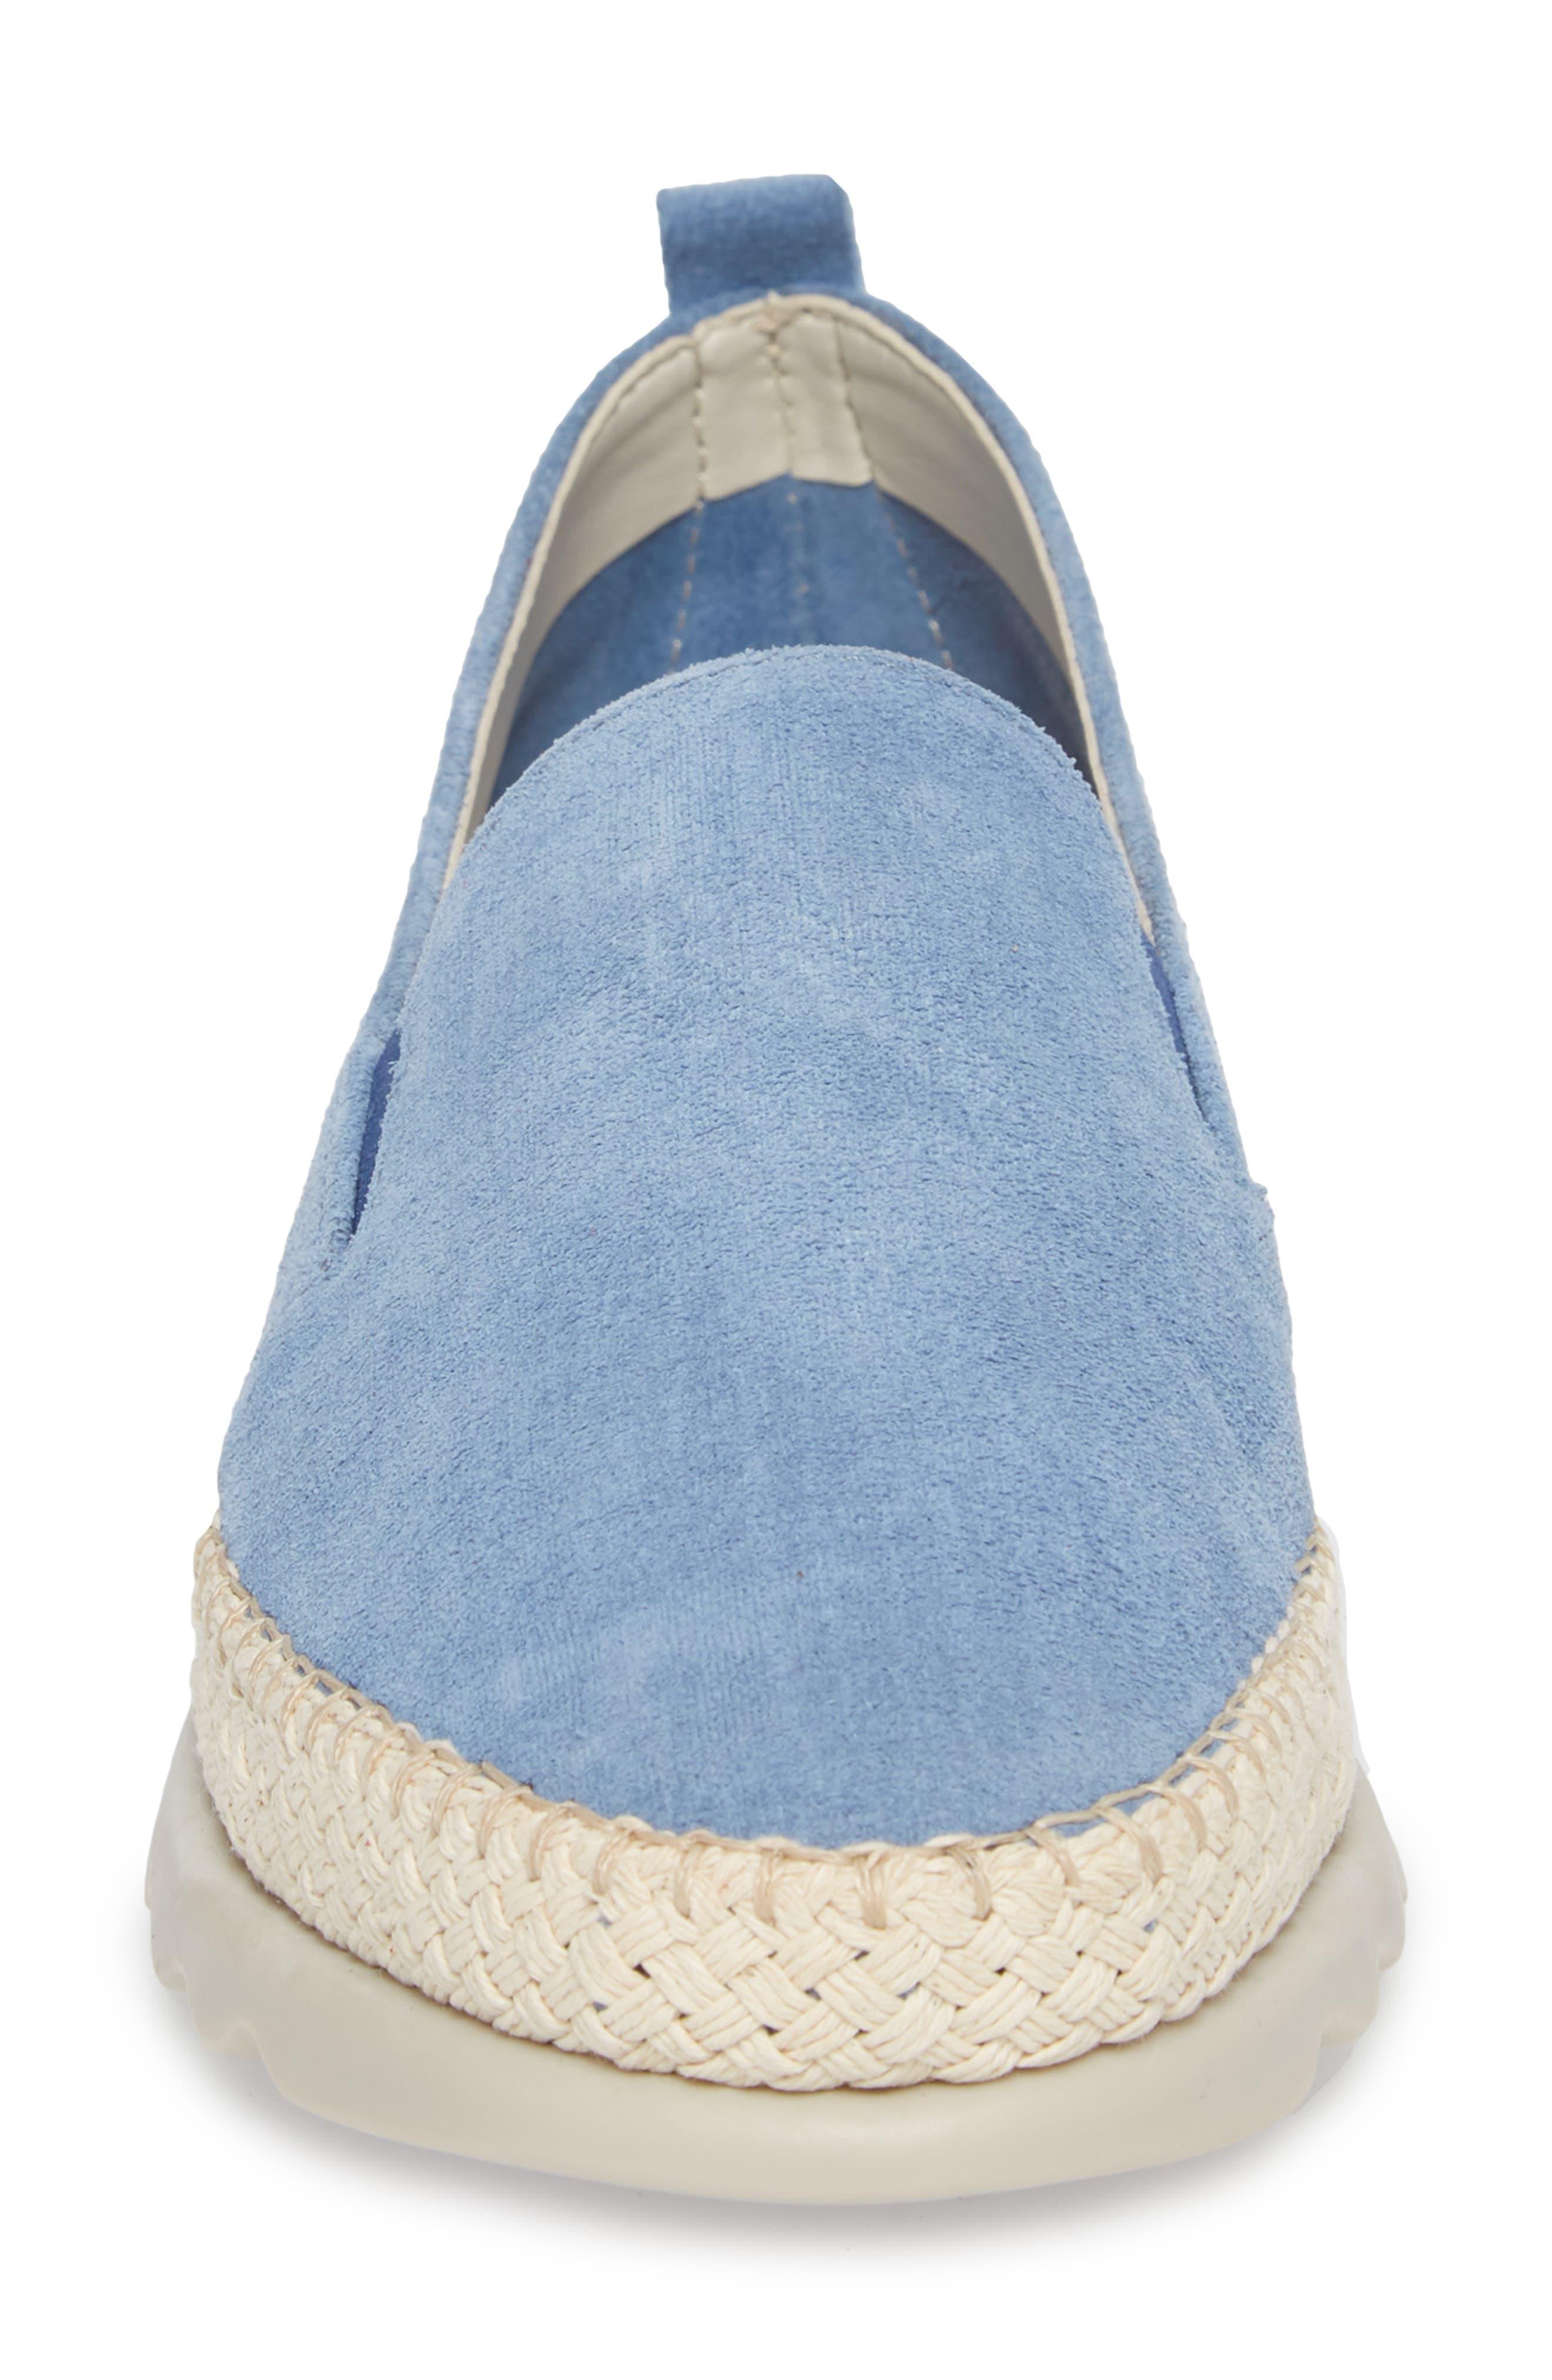 Chappie Slip-On Sneaker,                             Alternate thumbnail 4, color,                             DENIM PRINTED SUEDE